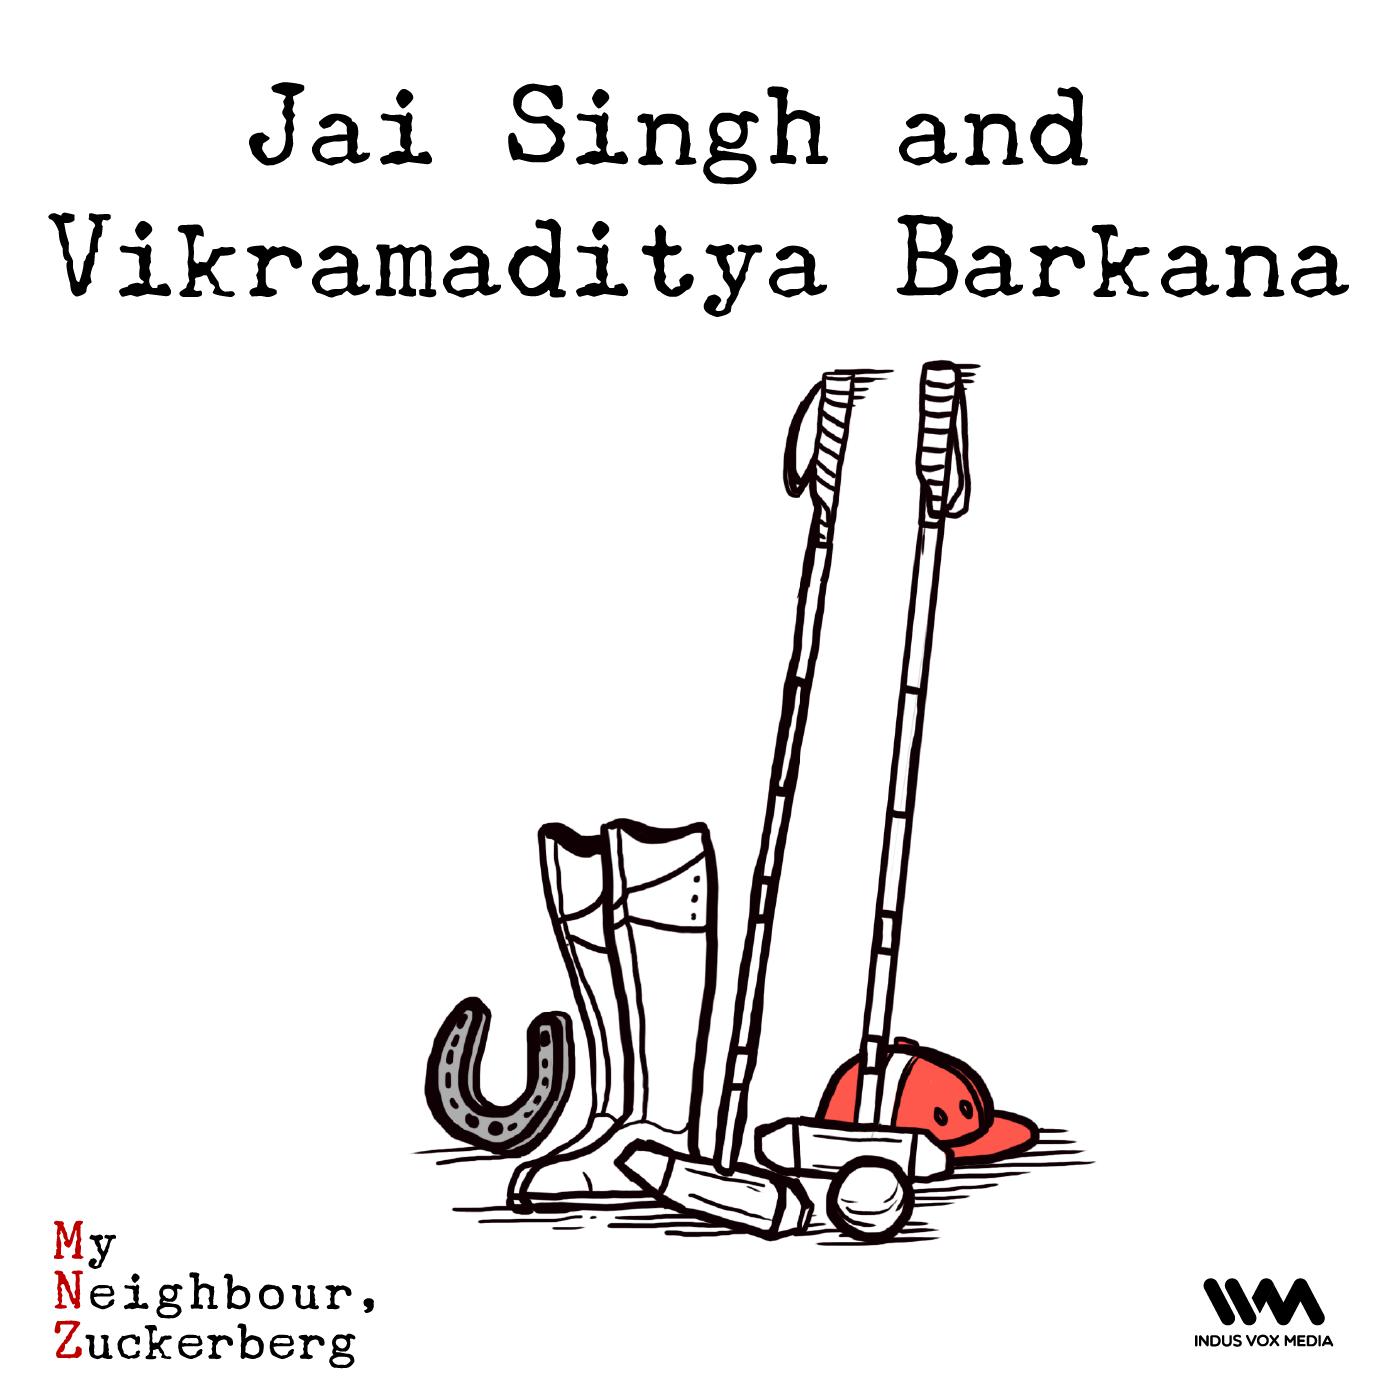 Ep. 13: Jai Singh and Vikramaditya Barkana